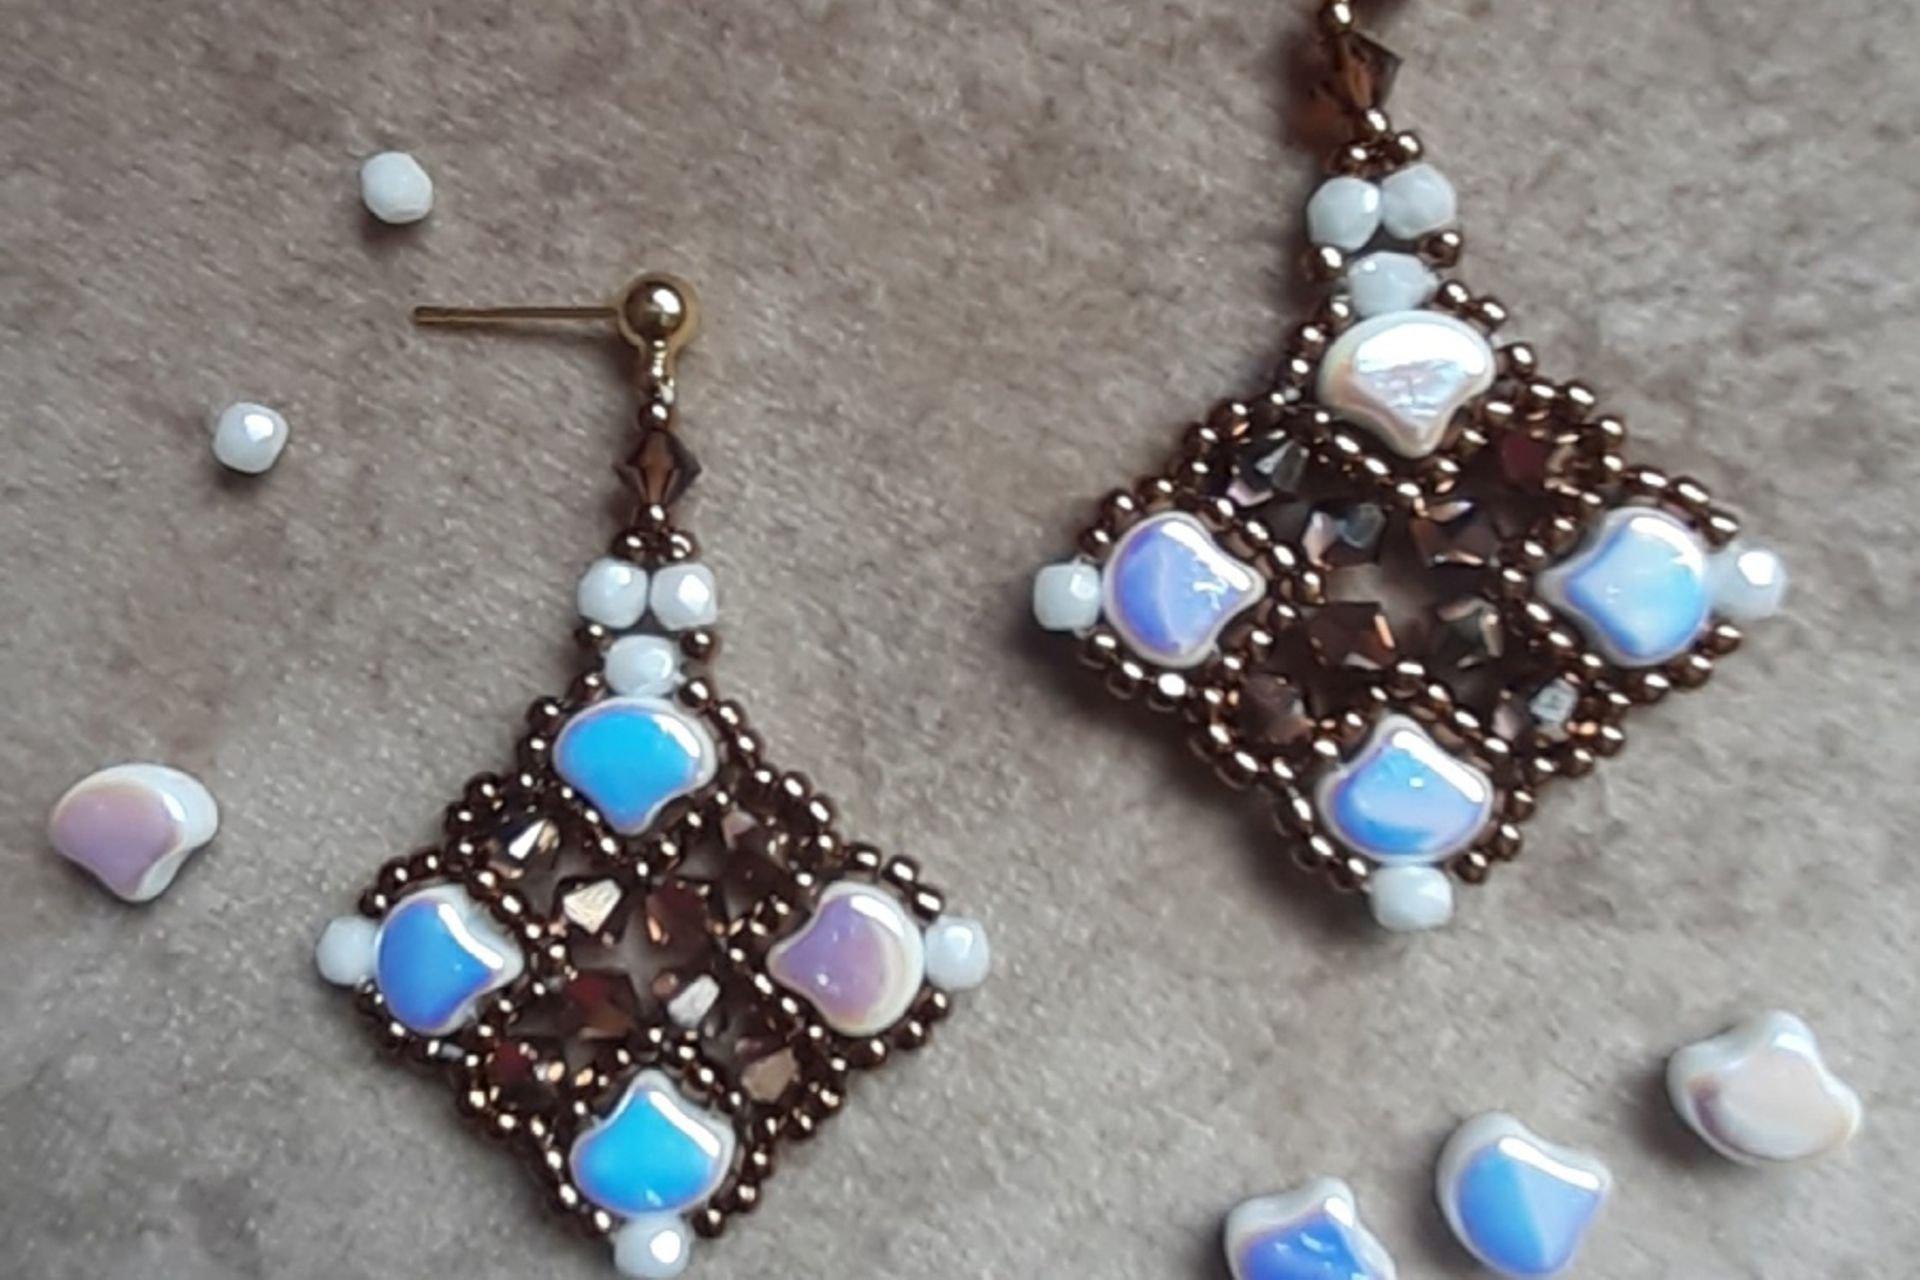 13 lantana beads jewelry designer תְמוּנָה